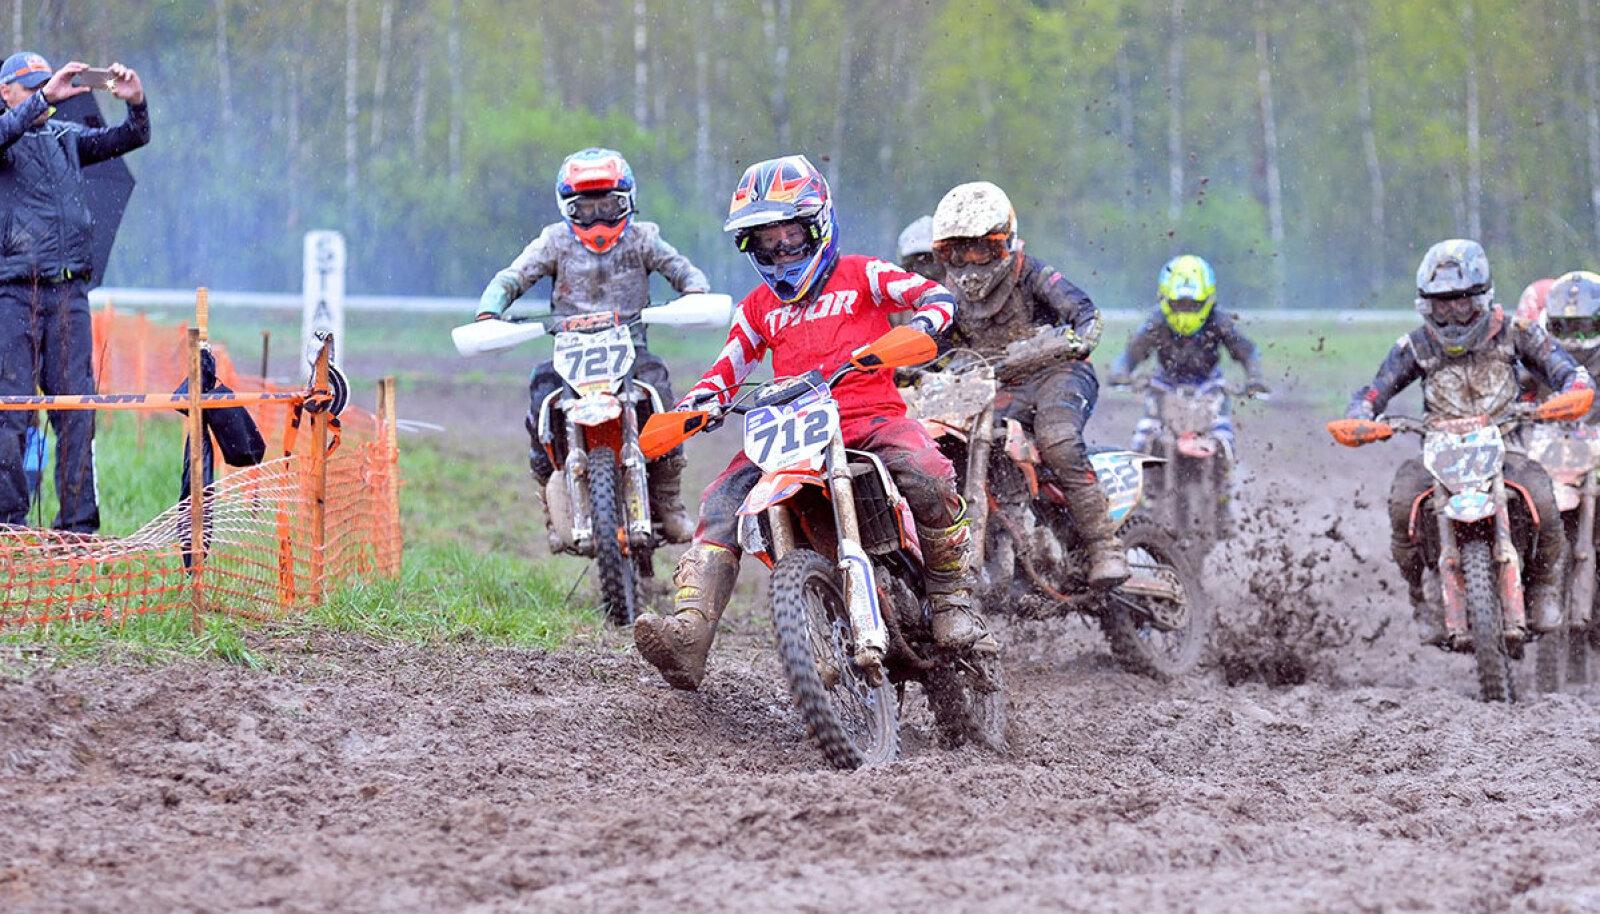 Olerex motokrossi noortesarja teine etapp